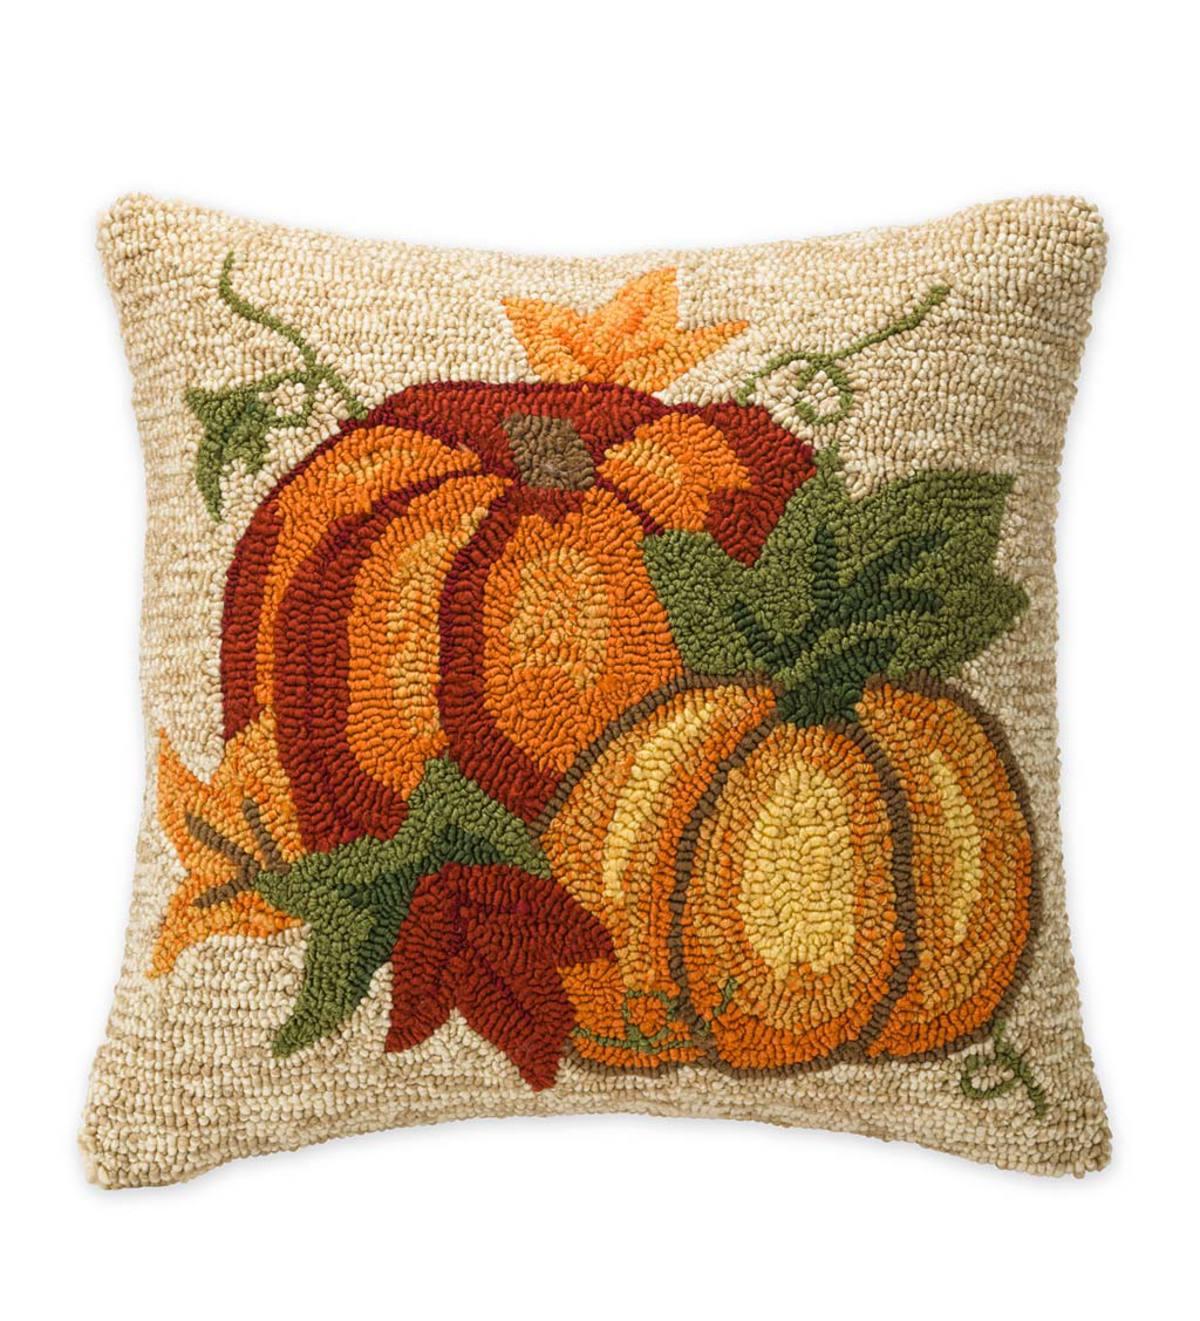 Indoor Outdoor Pumpkin Throw Pillow Plowhearth